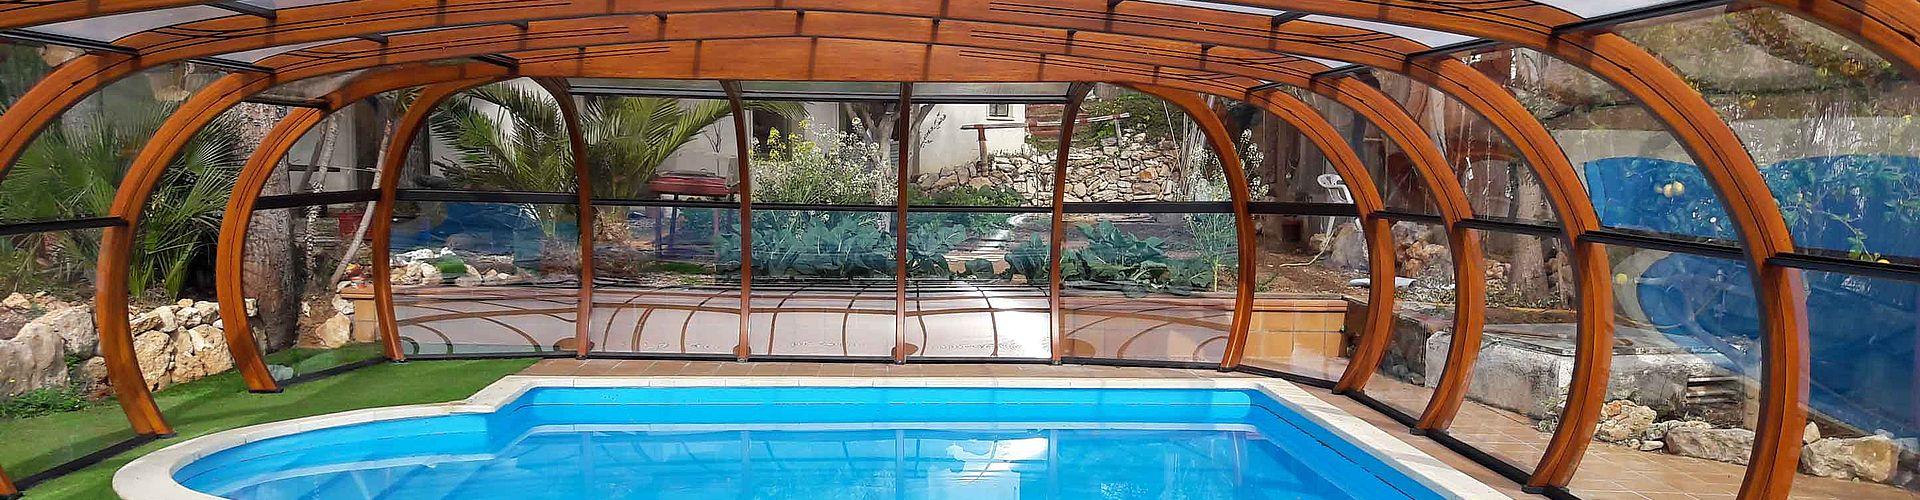 depann abris piscines renovation